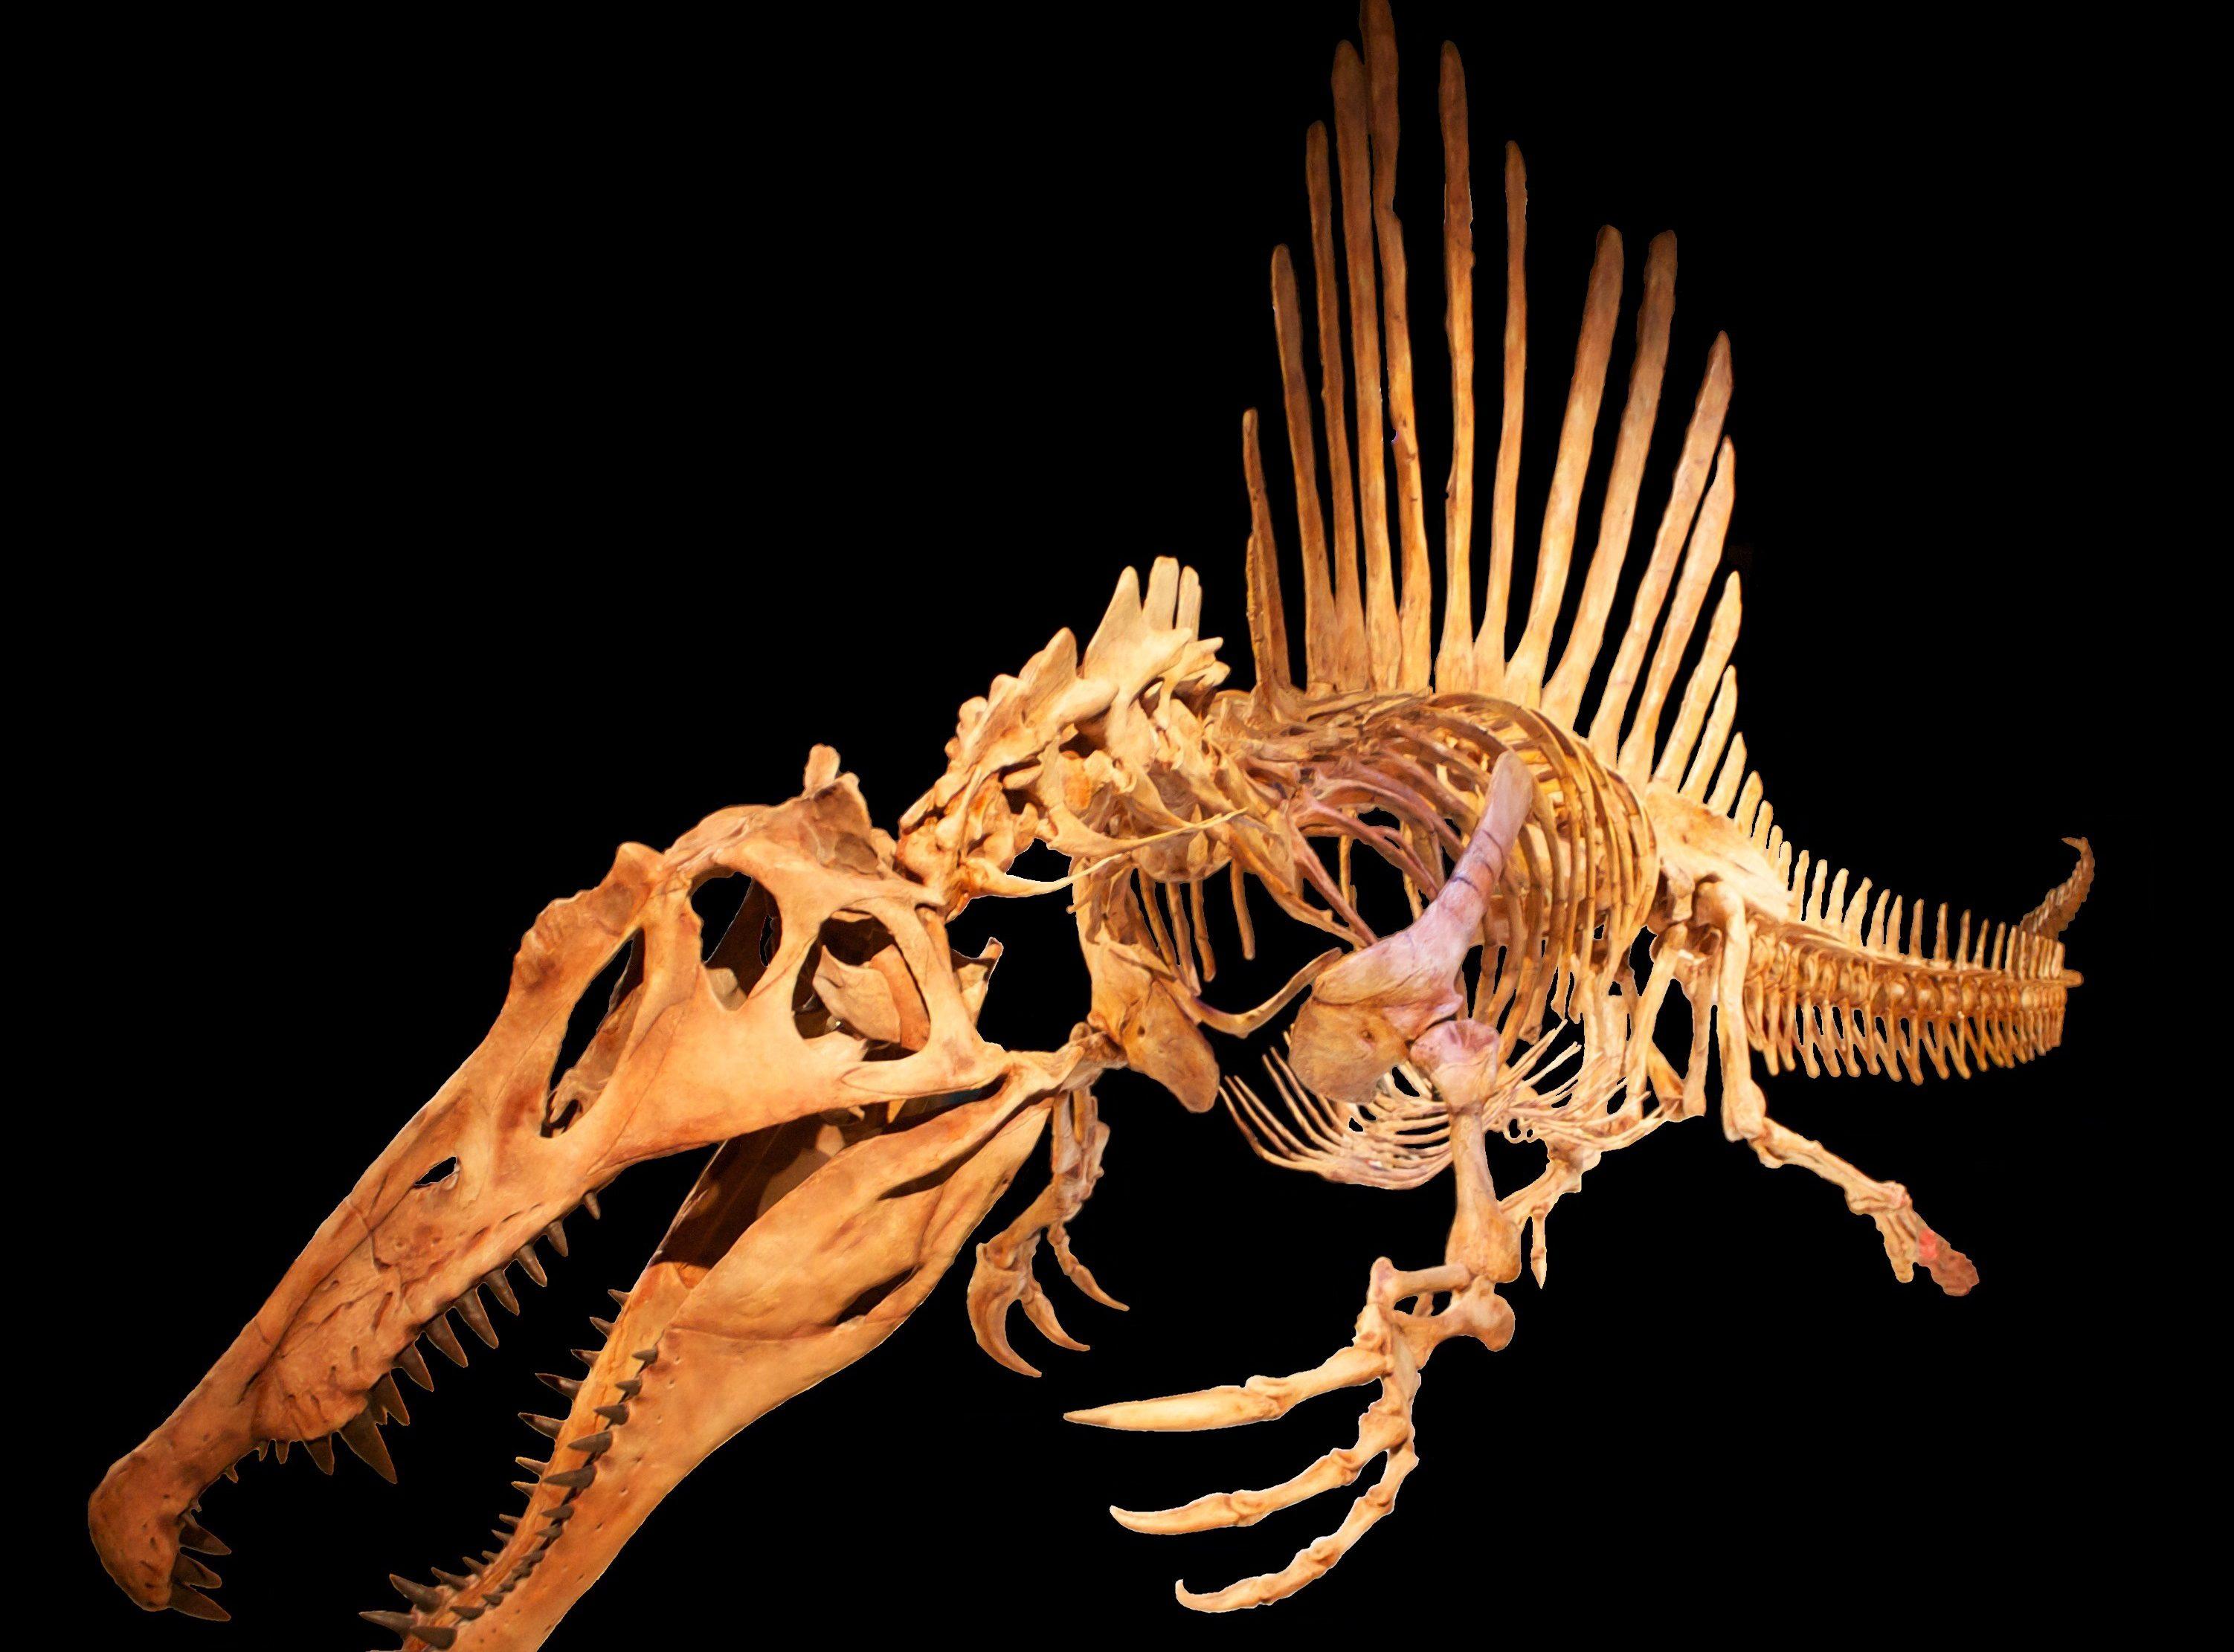 African fossils are understudied in paleontology — Quartz Africa